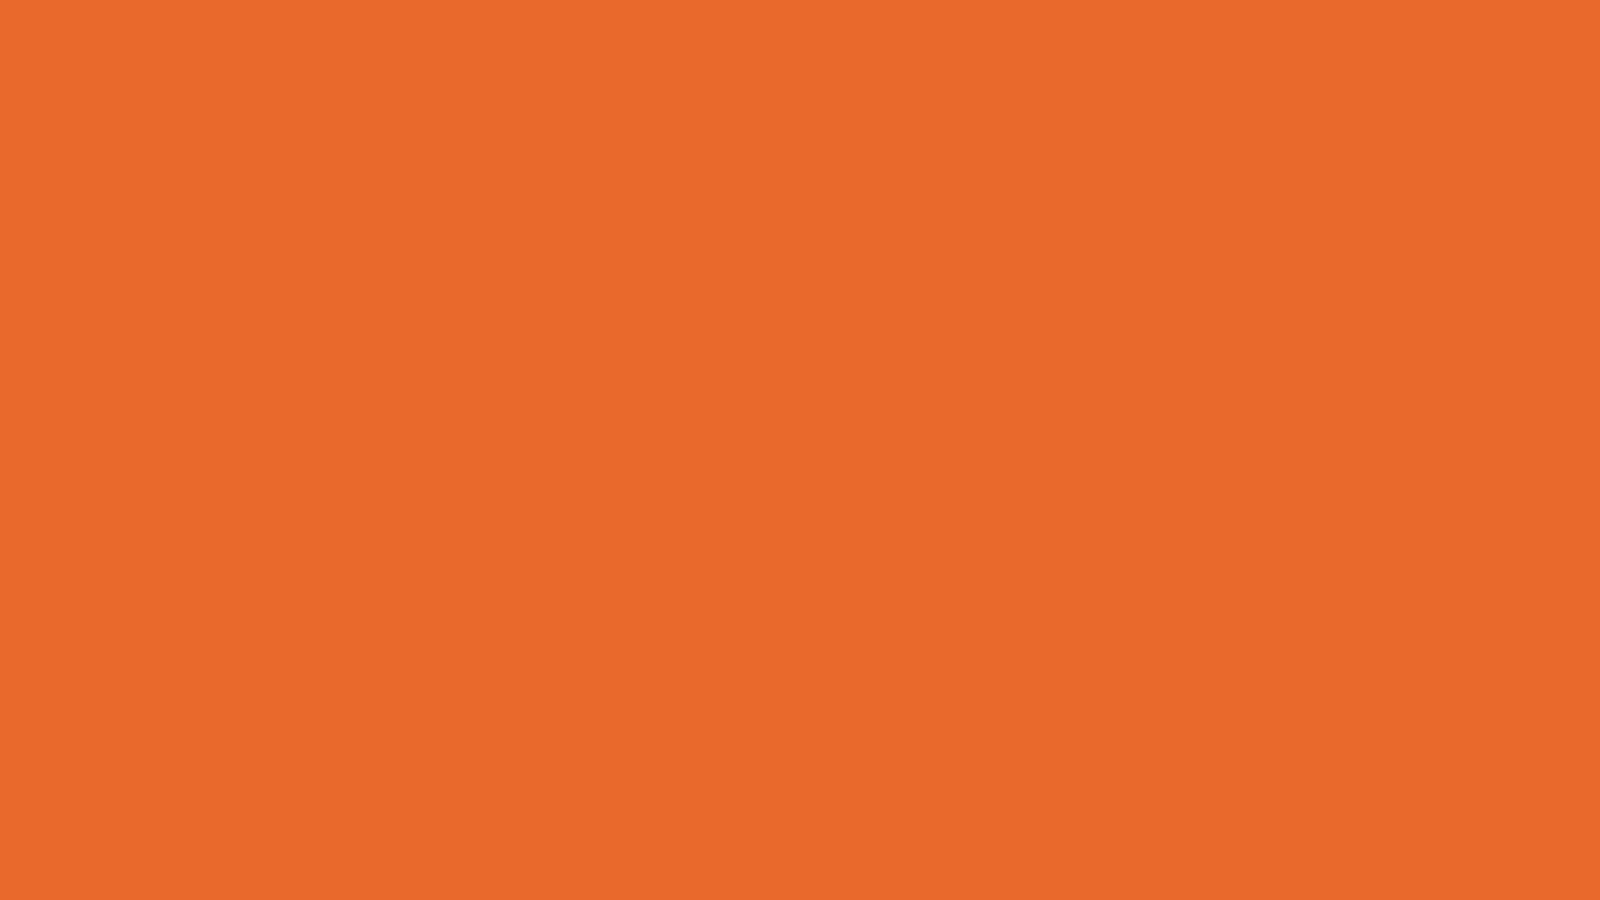 1600x900 Deep Carrot Orange Solid Color Background